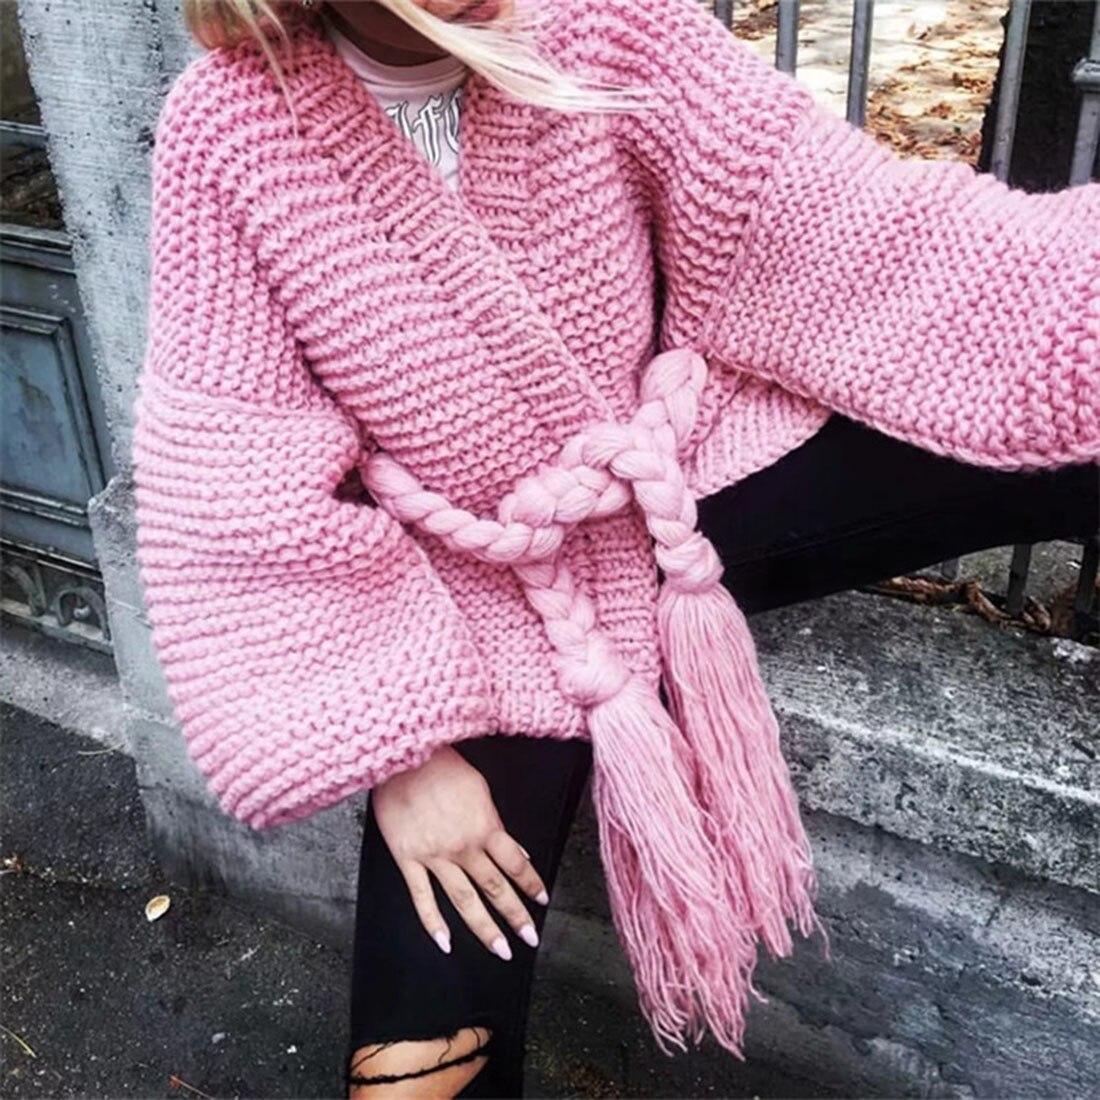 Poncho De Mano Suelto A Para Linterna Beige Cárdigan Mujer gray Ganchillo  Fajas Suéter Tejido 2018 Punto pink Otoño Manga Invierno ... b68538043b9c